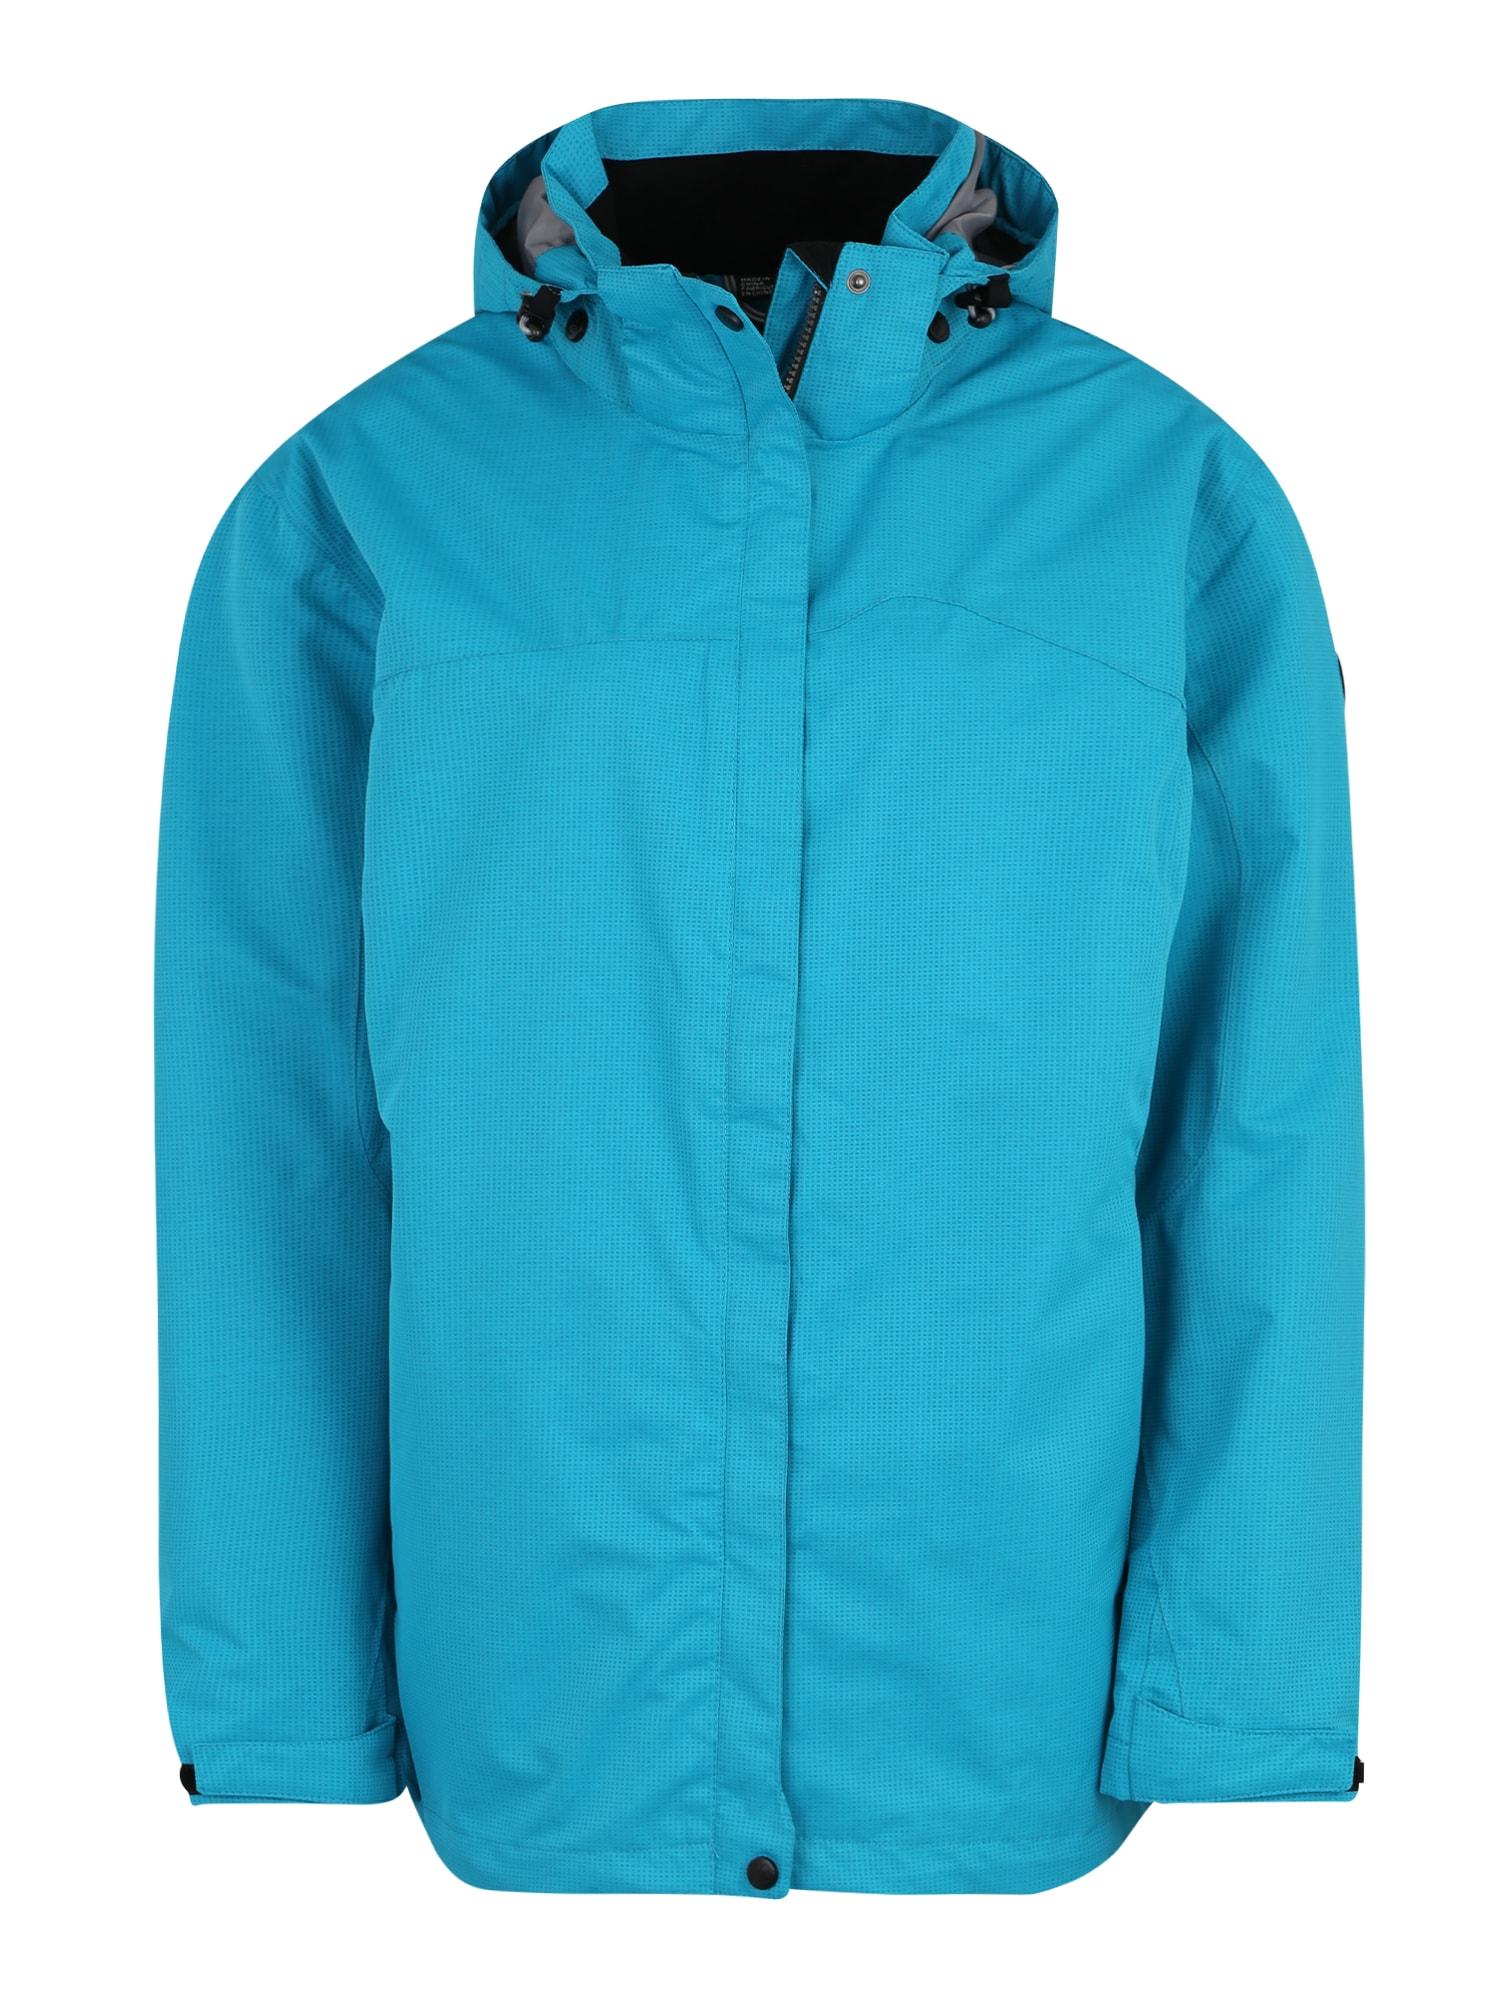 Outdoorová bunda Inkele modrá KILLTEC